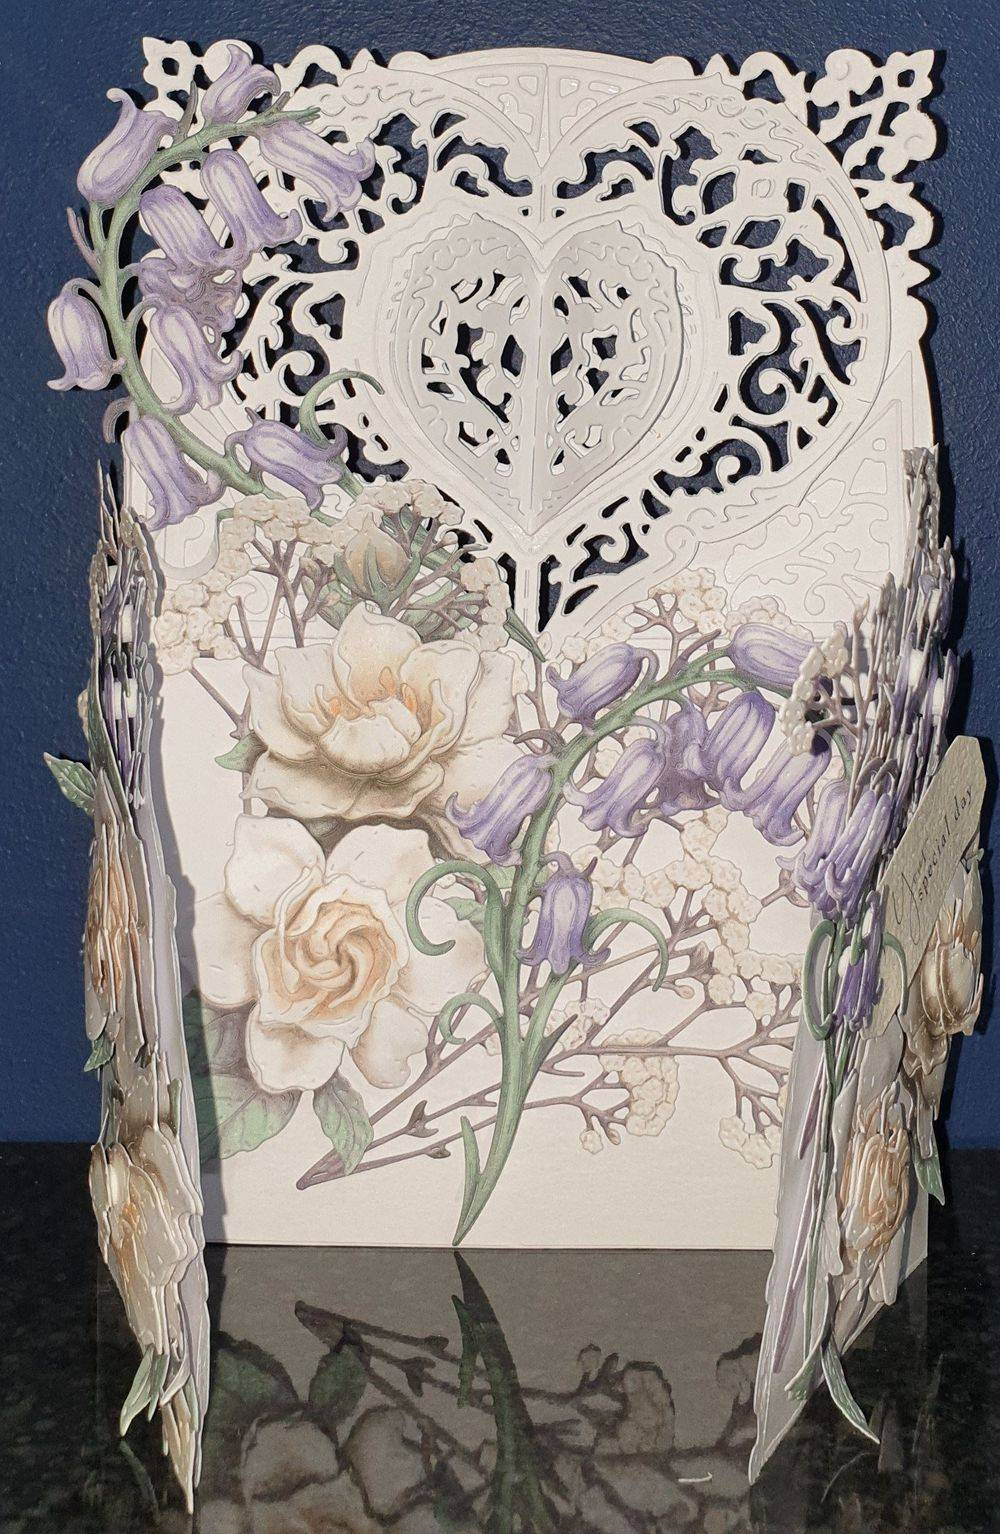 From the Heart - Bluebells & Gardenias - a